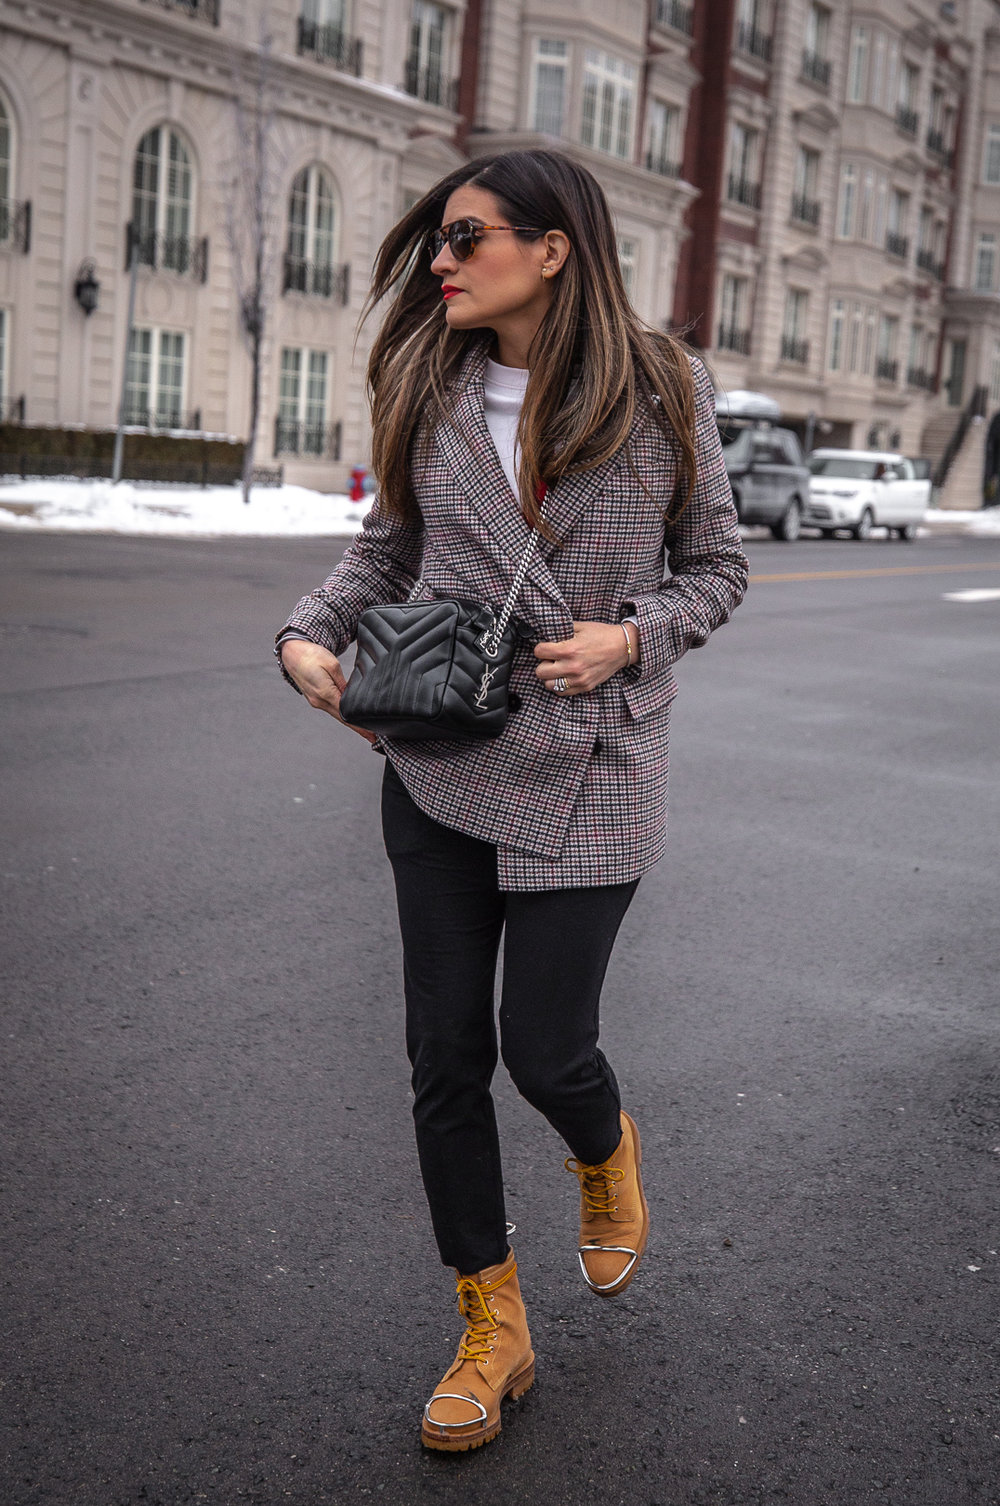 nathalie martin - anine bing lightning bold sweater, alexander wang lyndon boots, bonlook jerry glasses, plaid blazer, frank and eileen joggers, street style, pinterest @woahstyle_7141.jpg